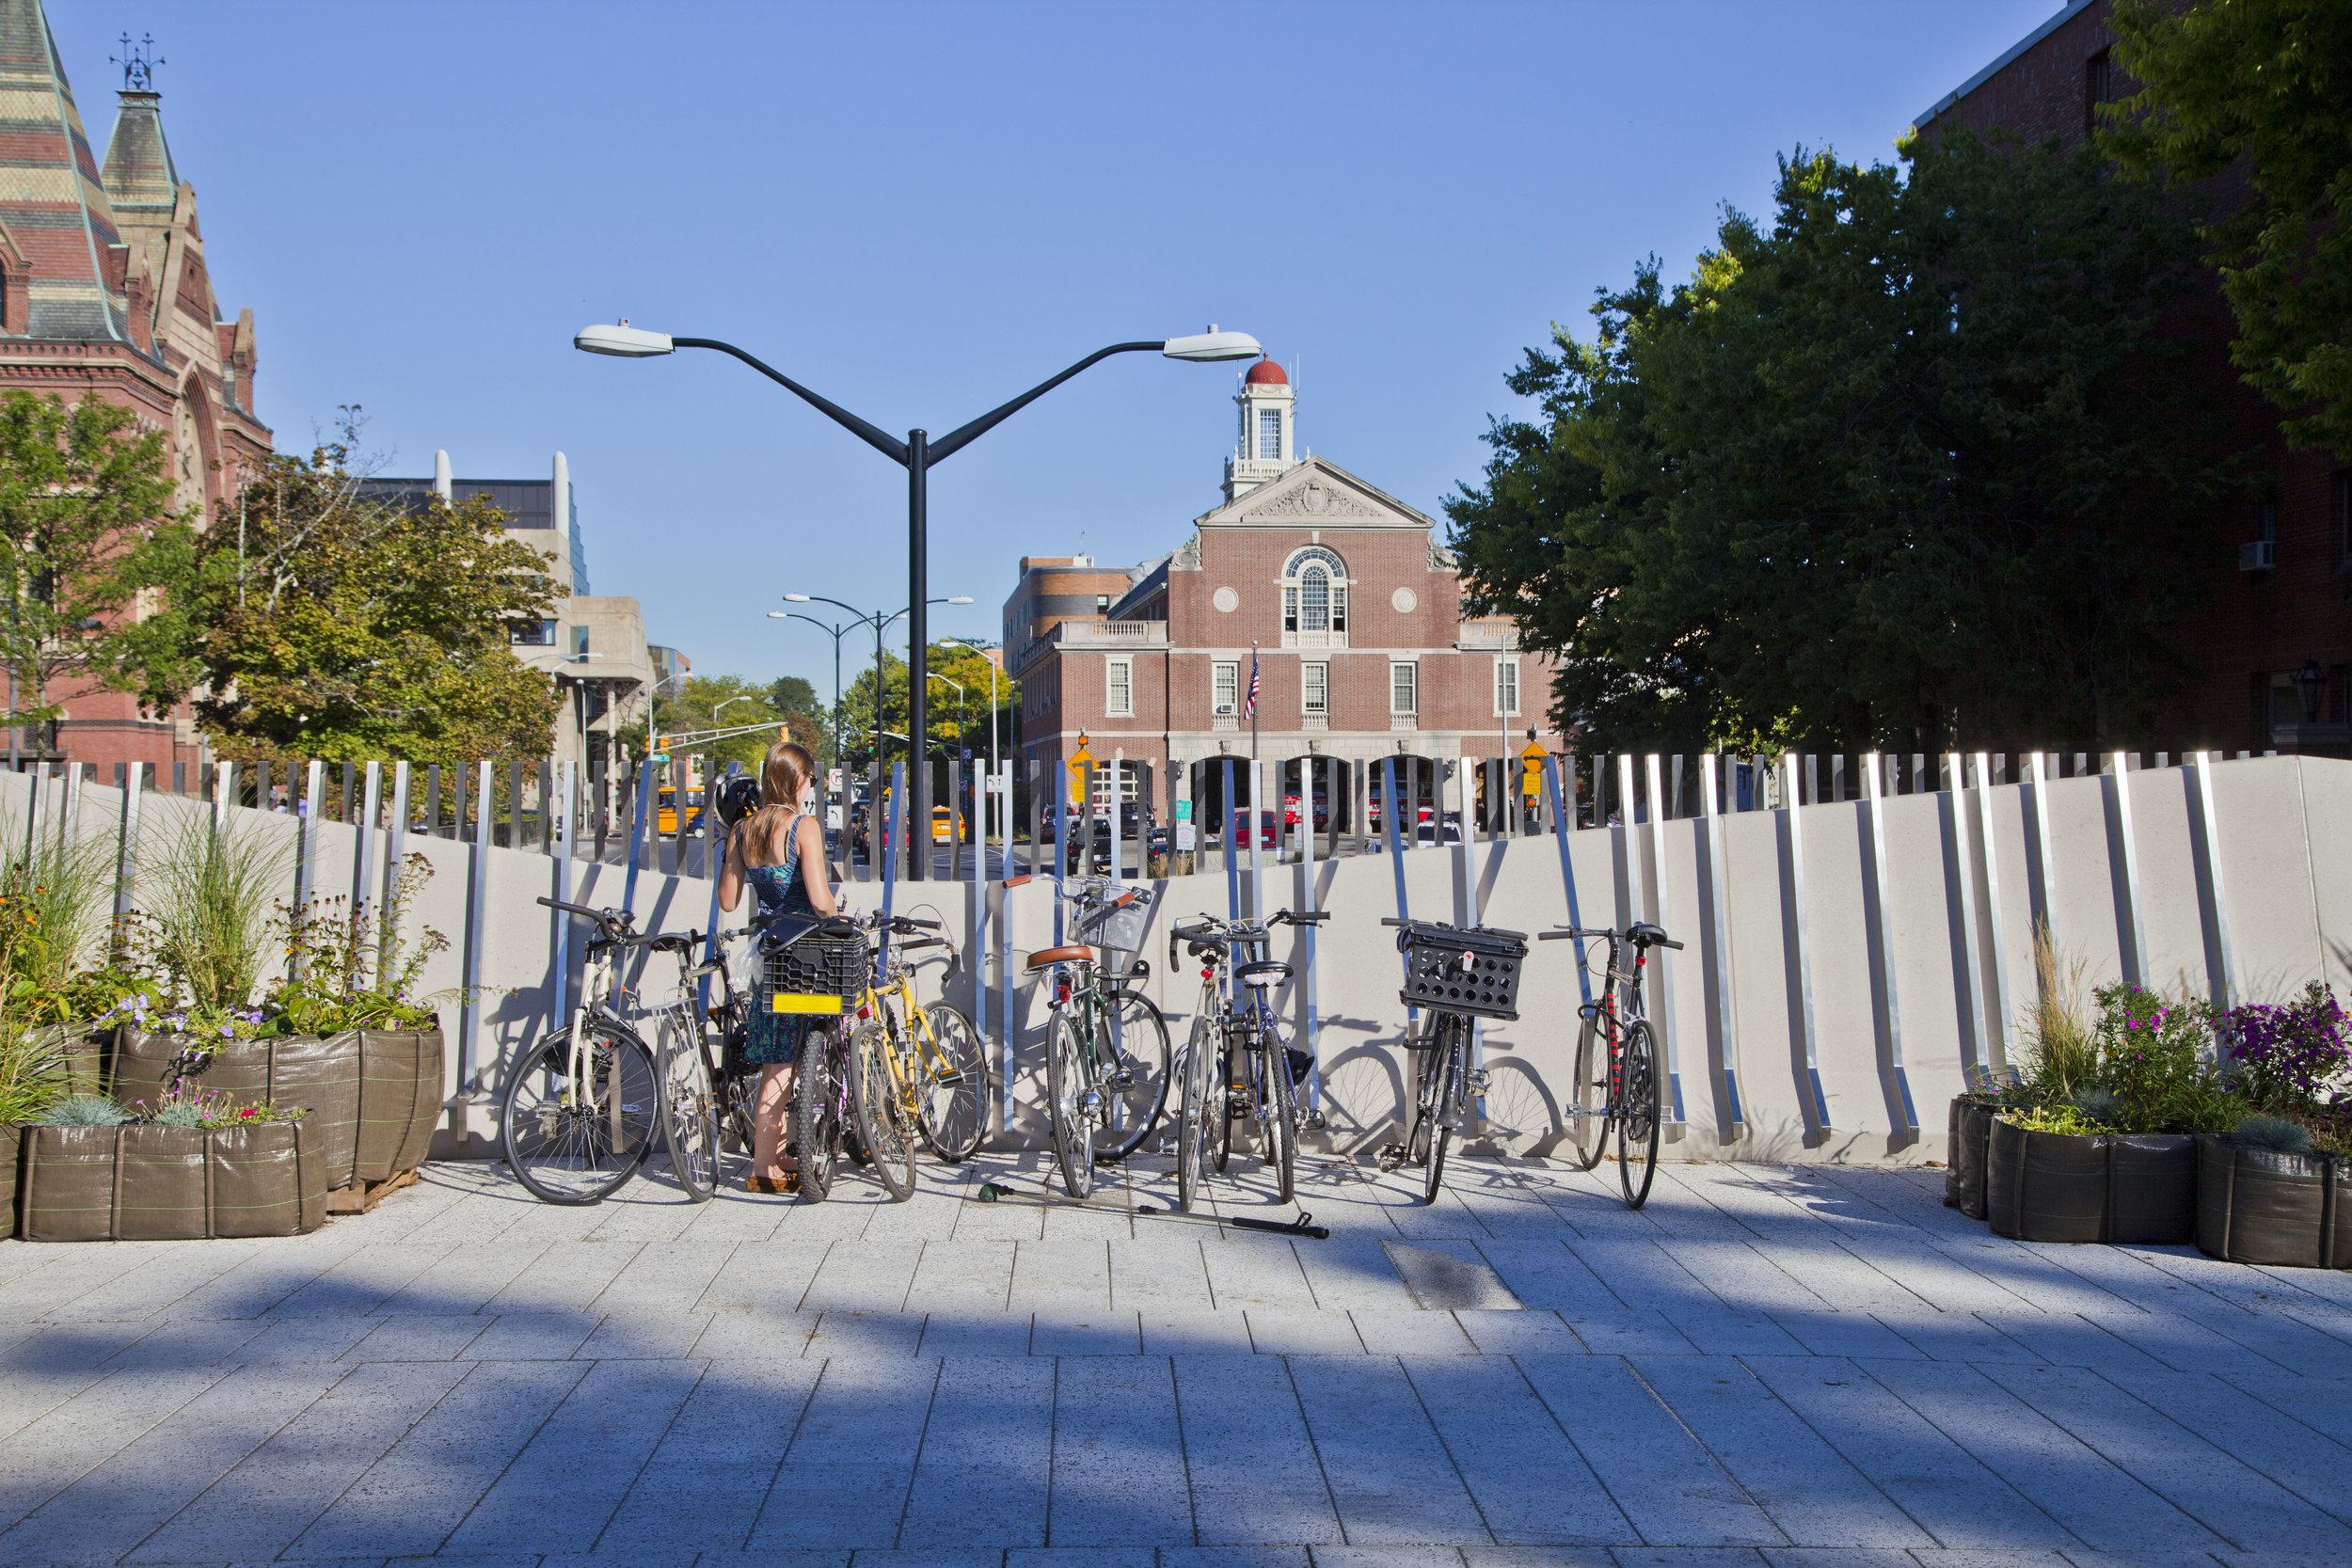 Stoss_Harvard Plaza-015_barrettdoherty.jpg